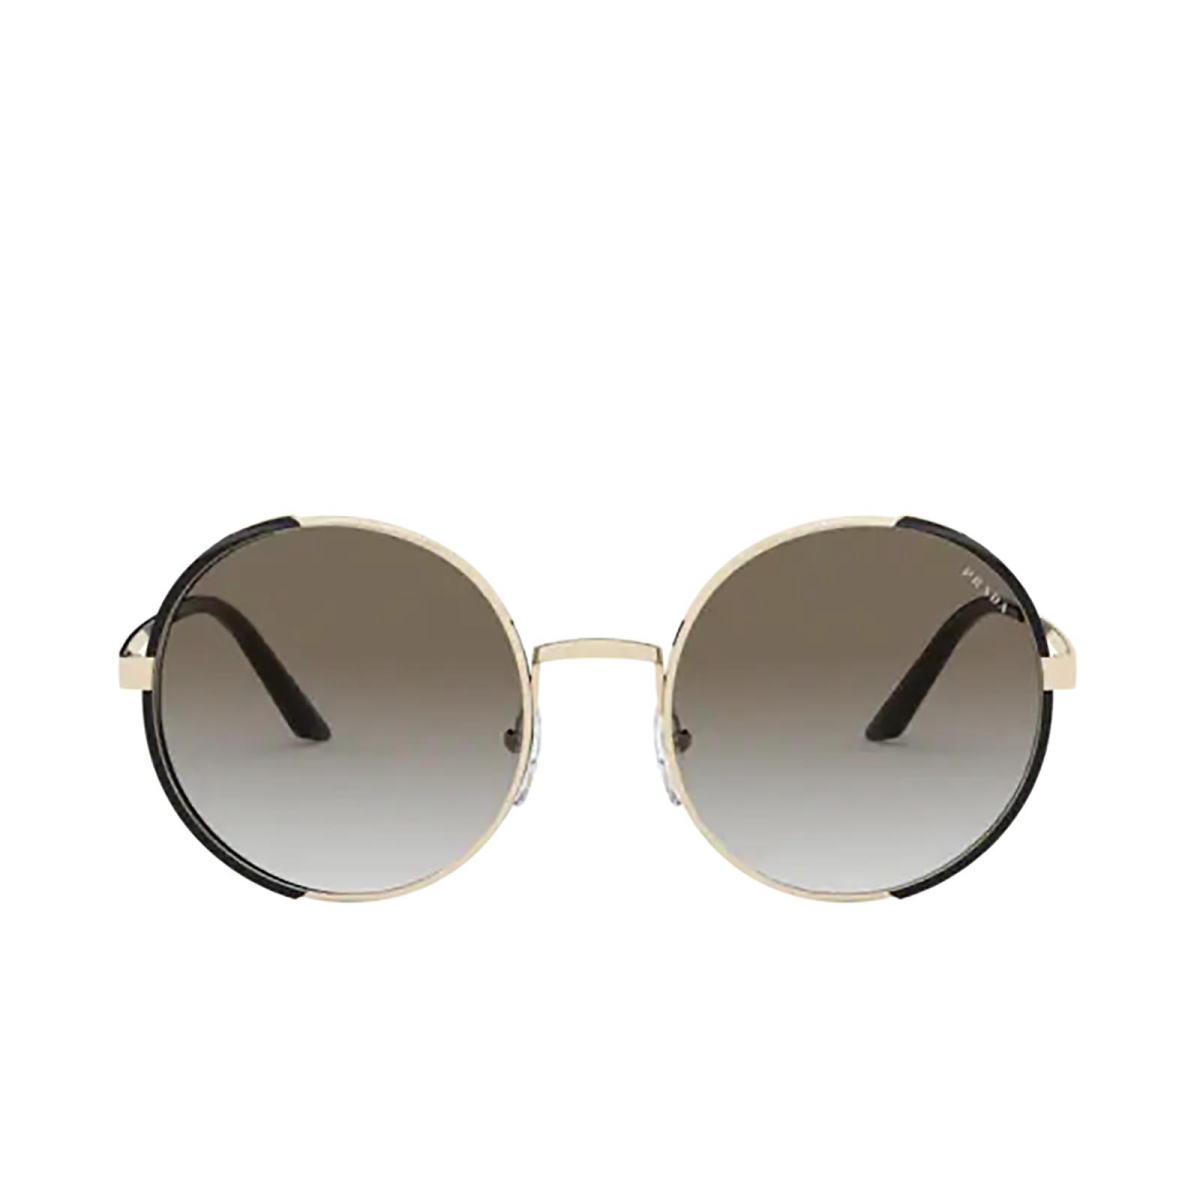 Prada® Round Sunglasses: PR 59XS color Pale Gold / Black AAV0A7.